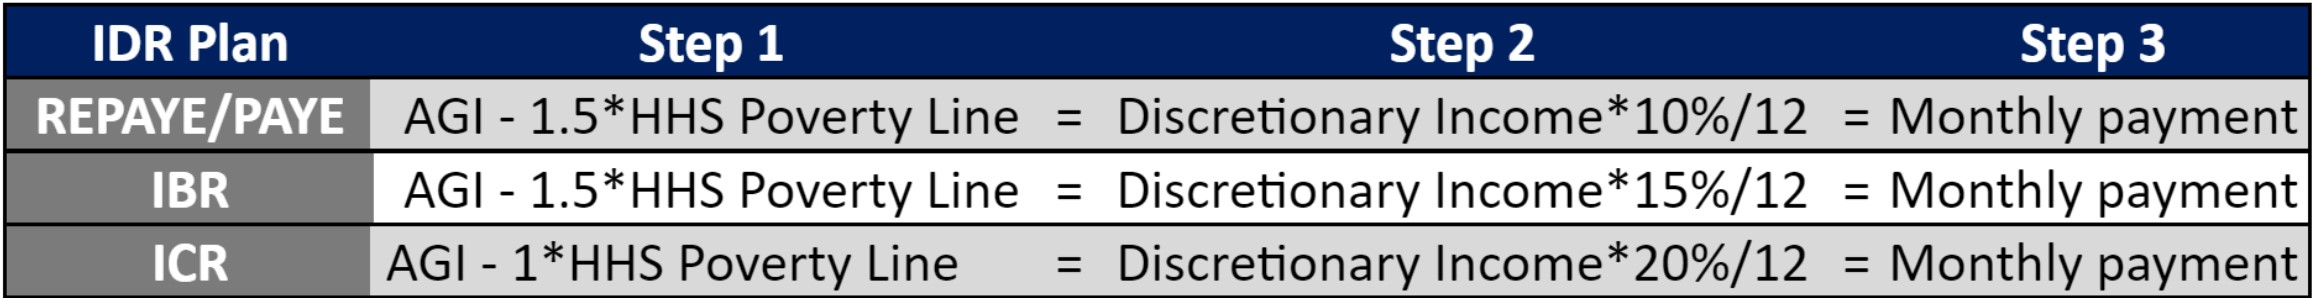 idr discretionary income chart